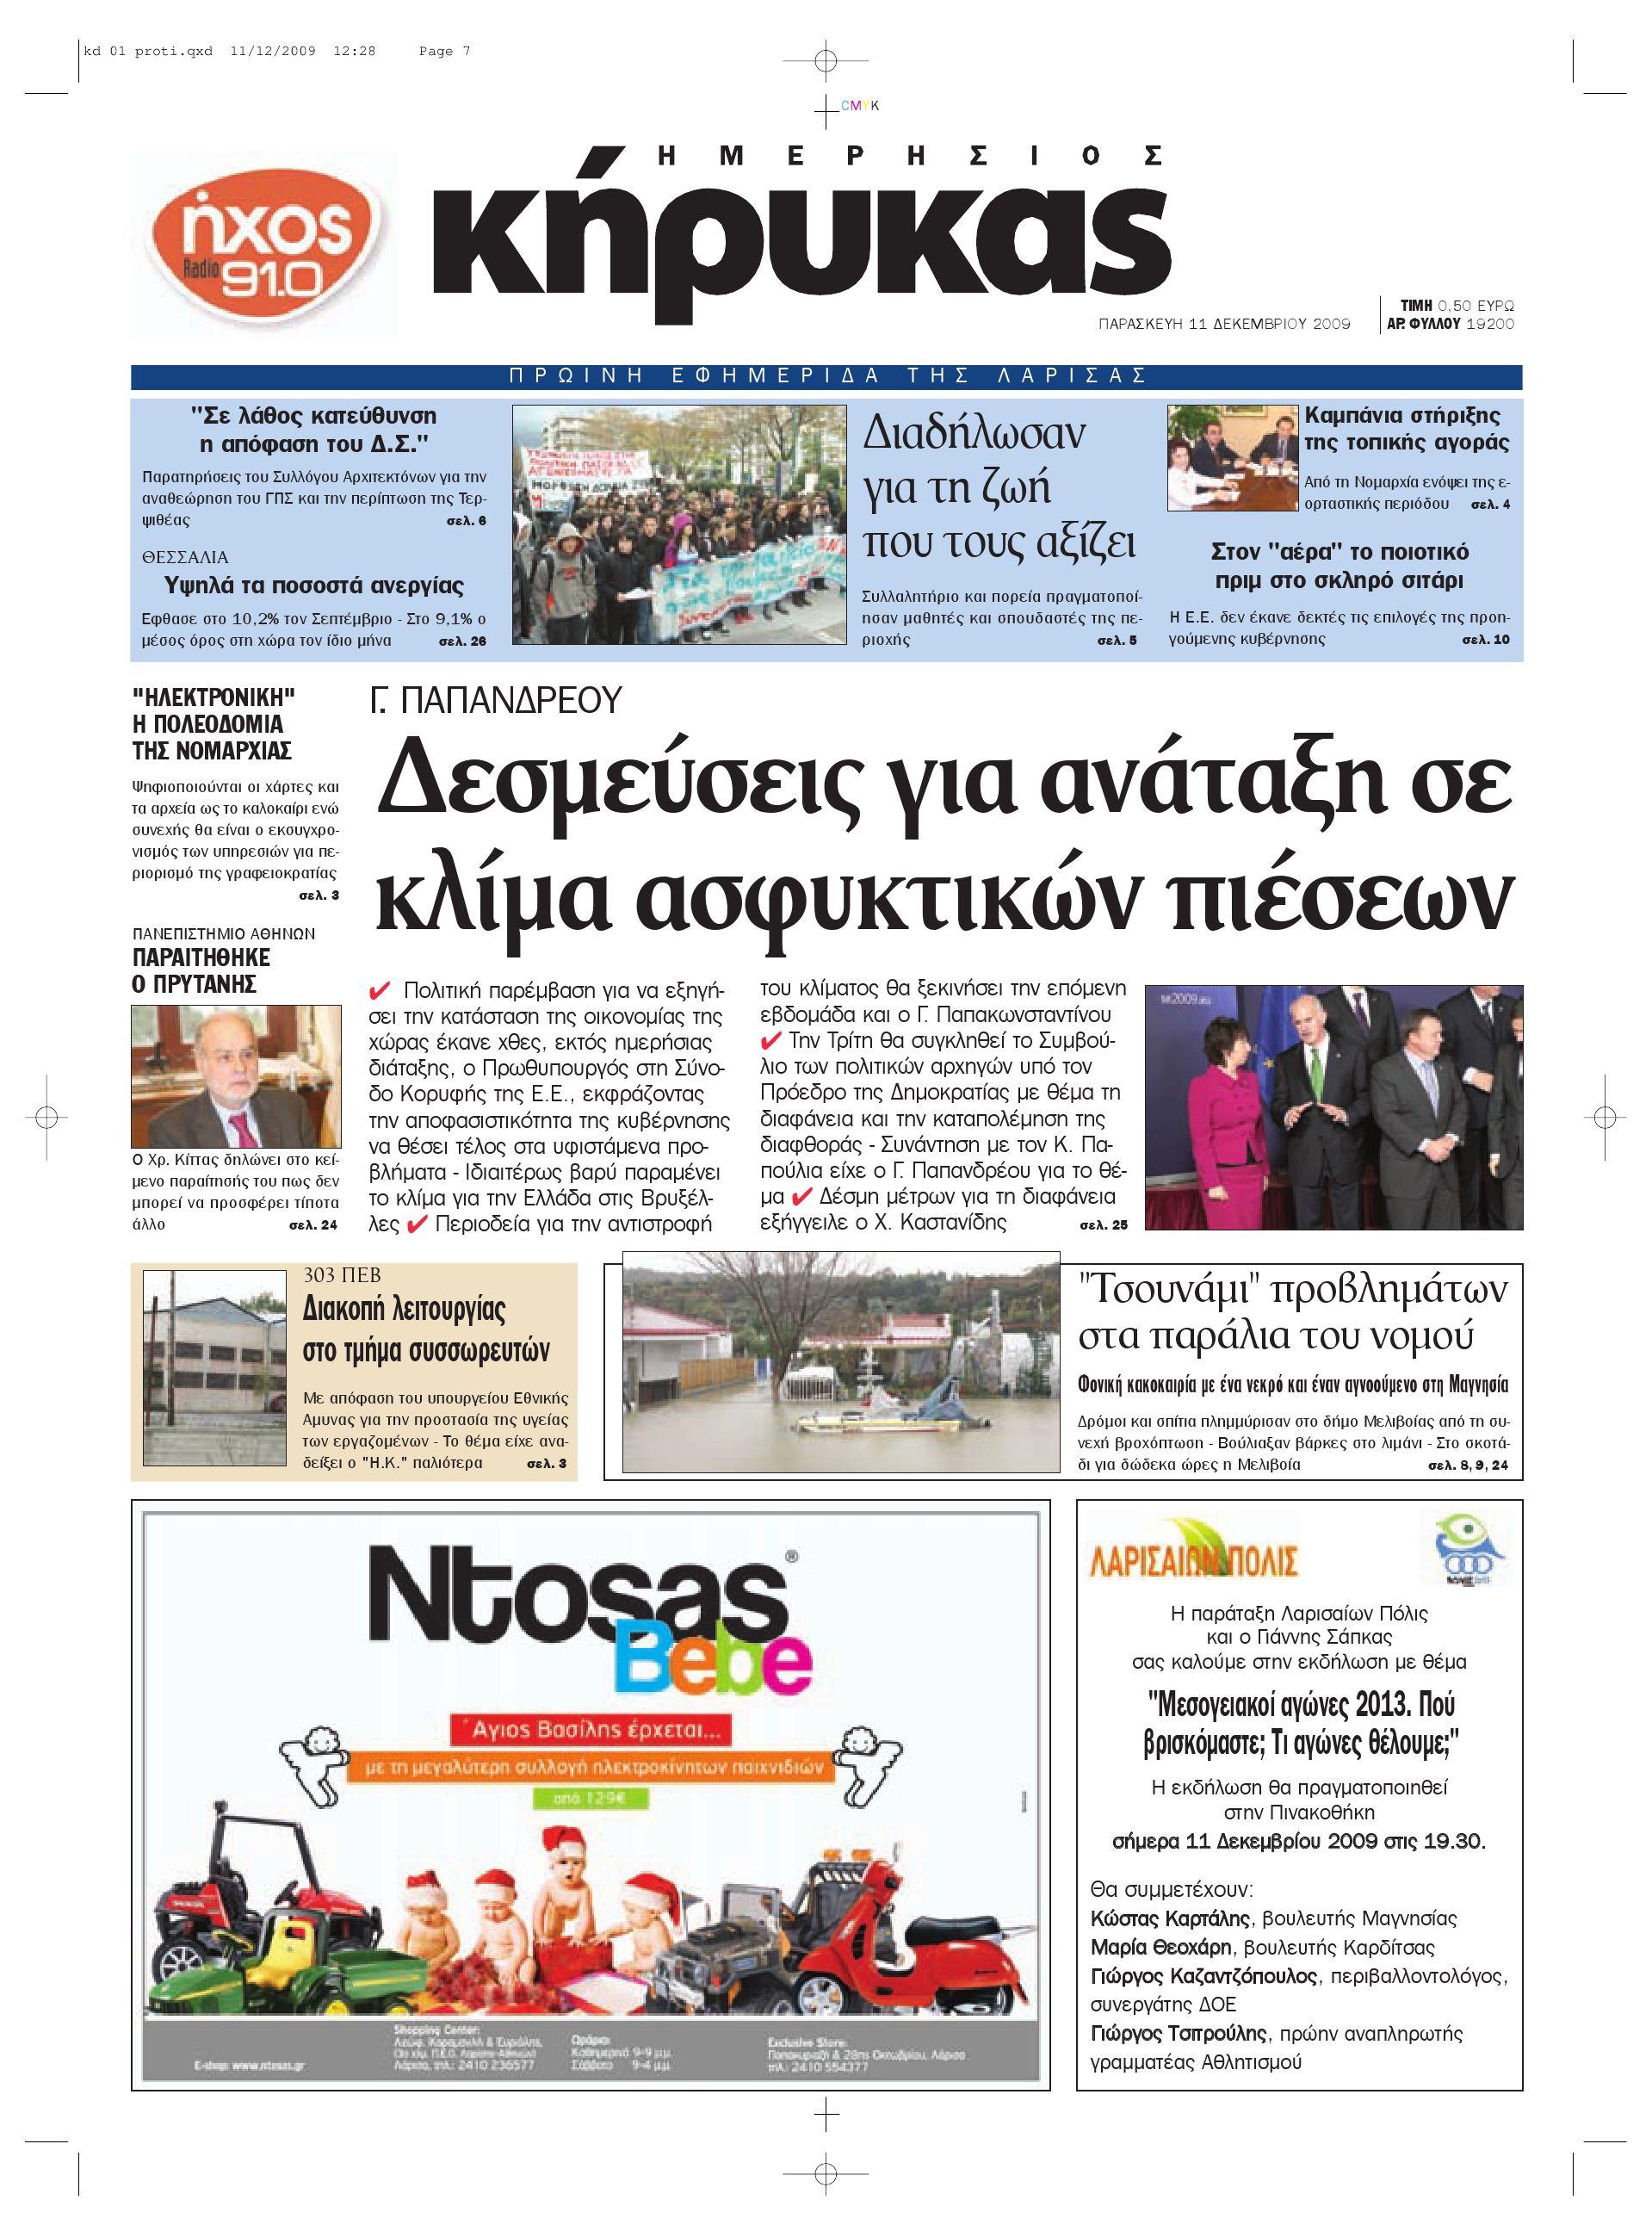 f574a894400 kirikas 11 12 2009 by Imerisios Kirikas - issuu